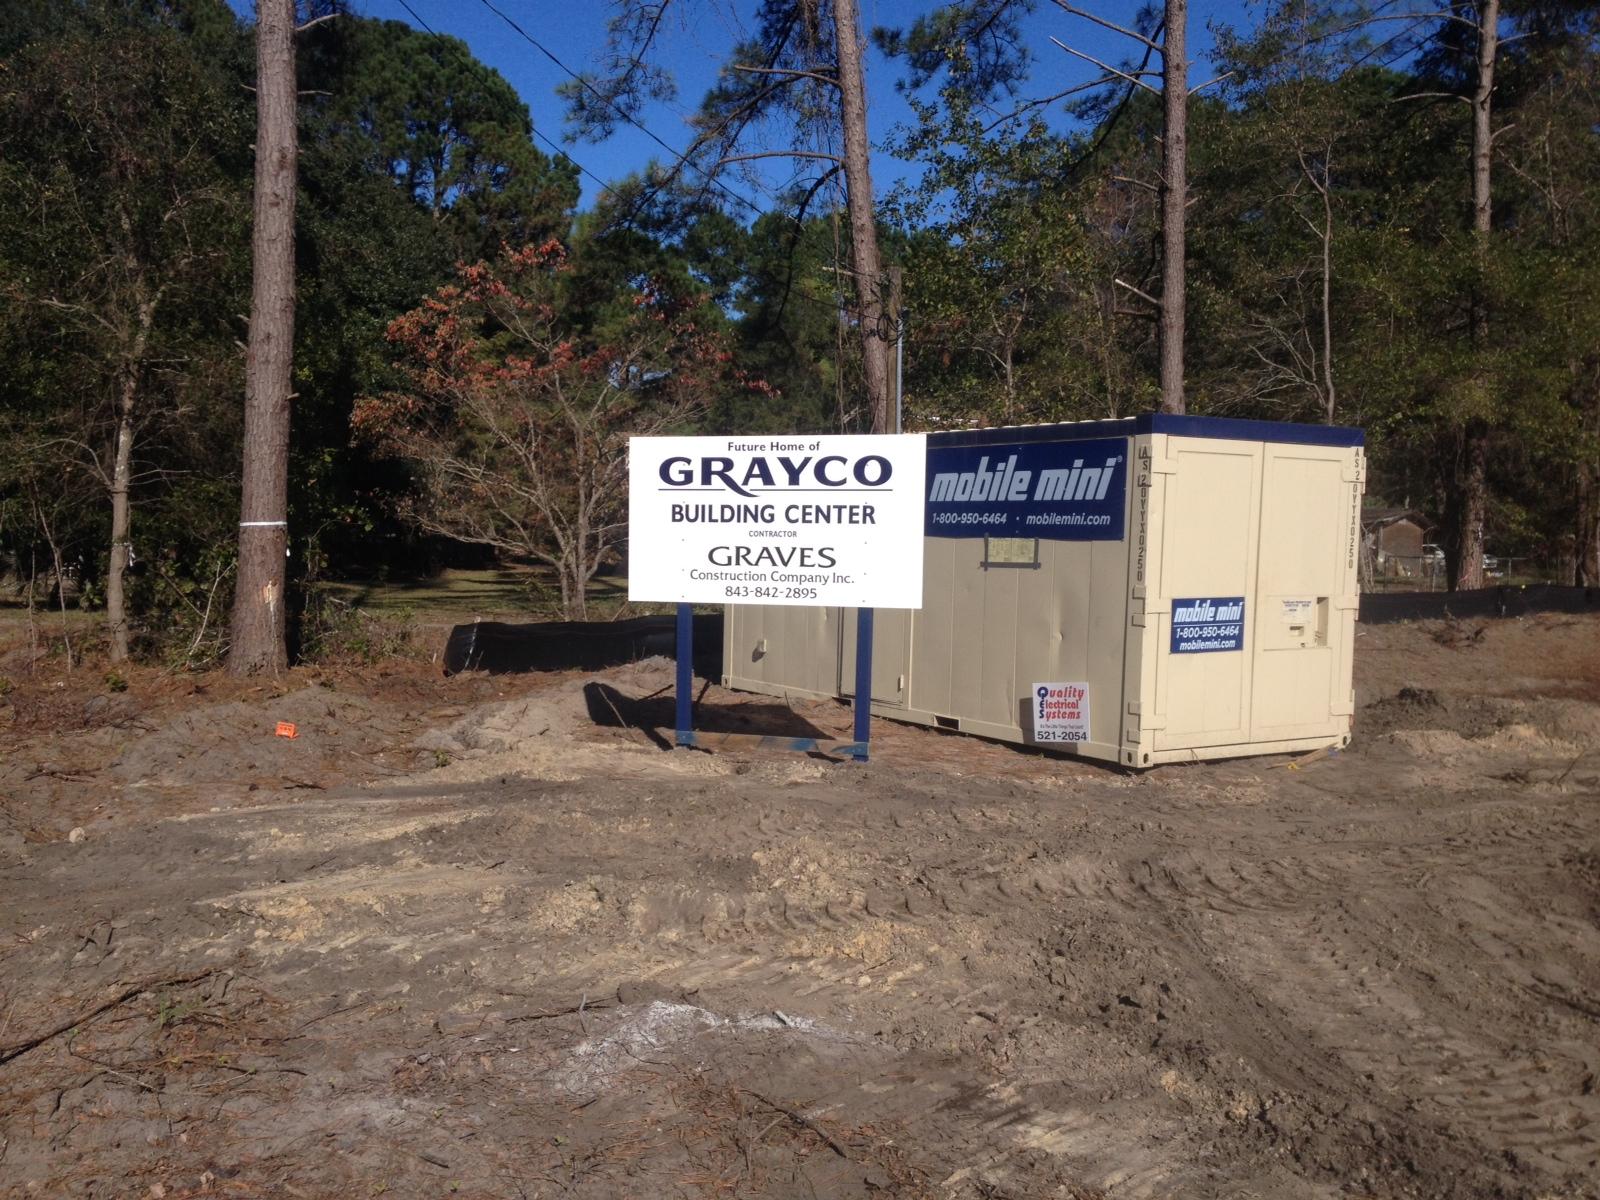 Grayco sign